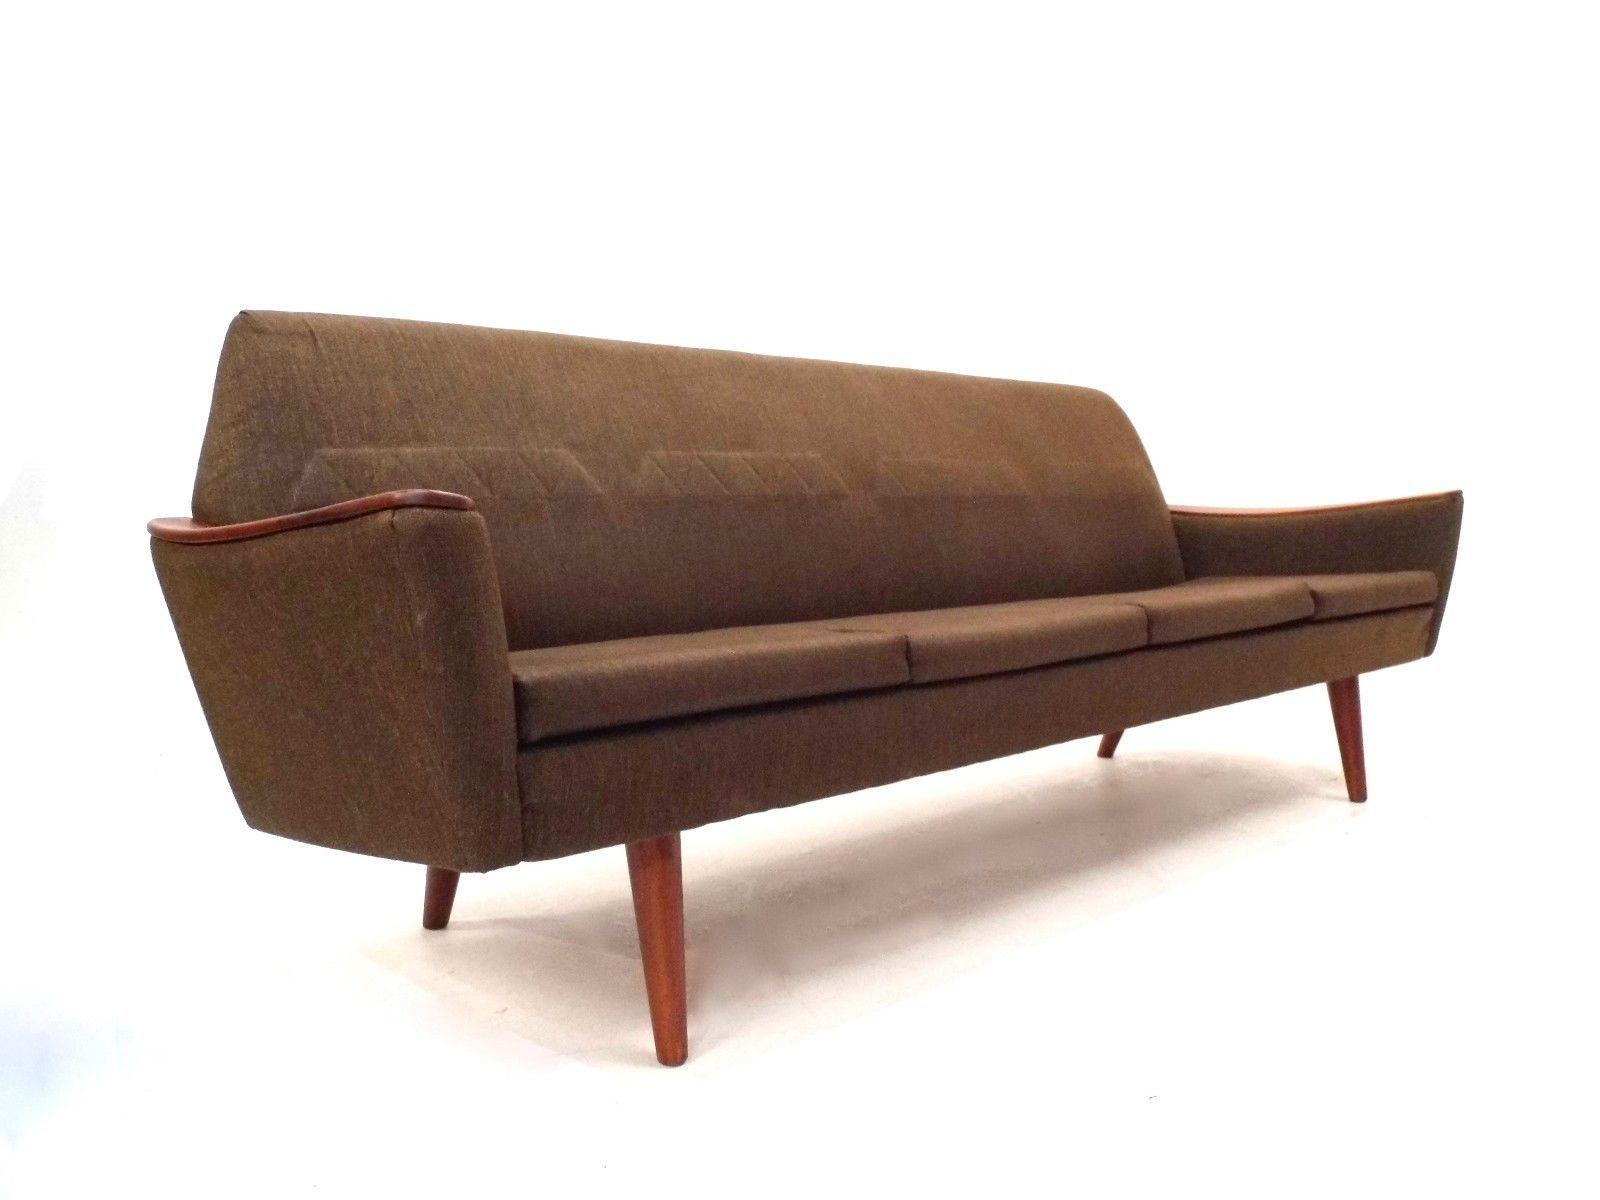 Brown Wool & Teak 4 Seater Sofa 1960s for sale at Pamono